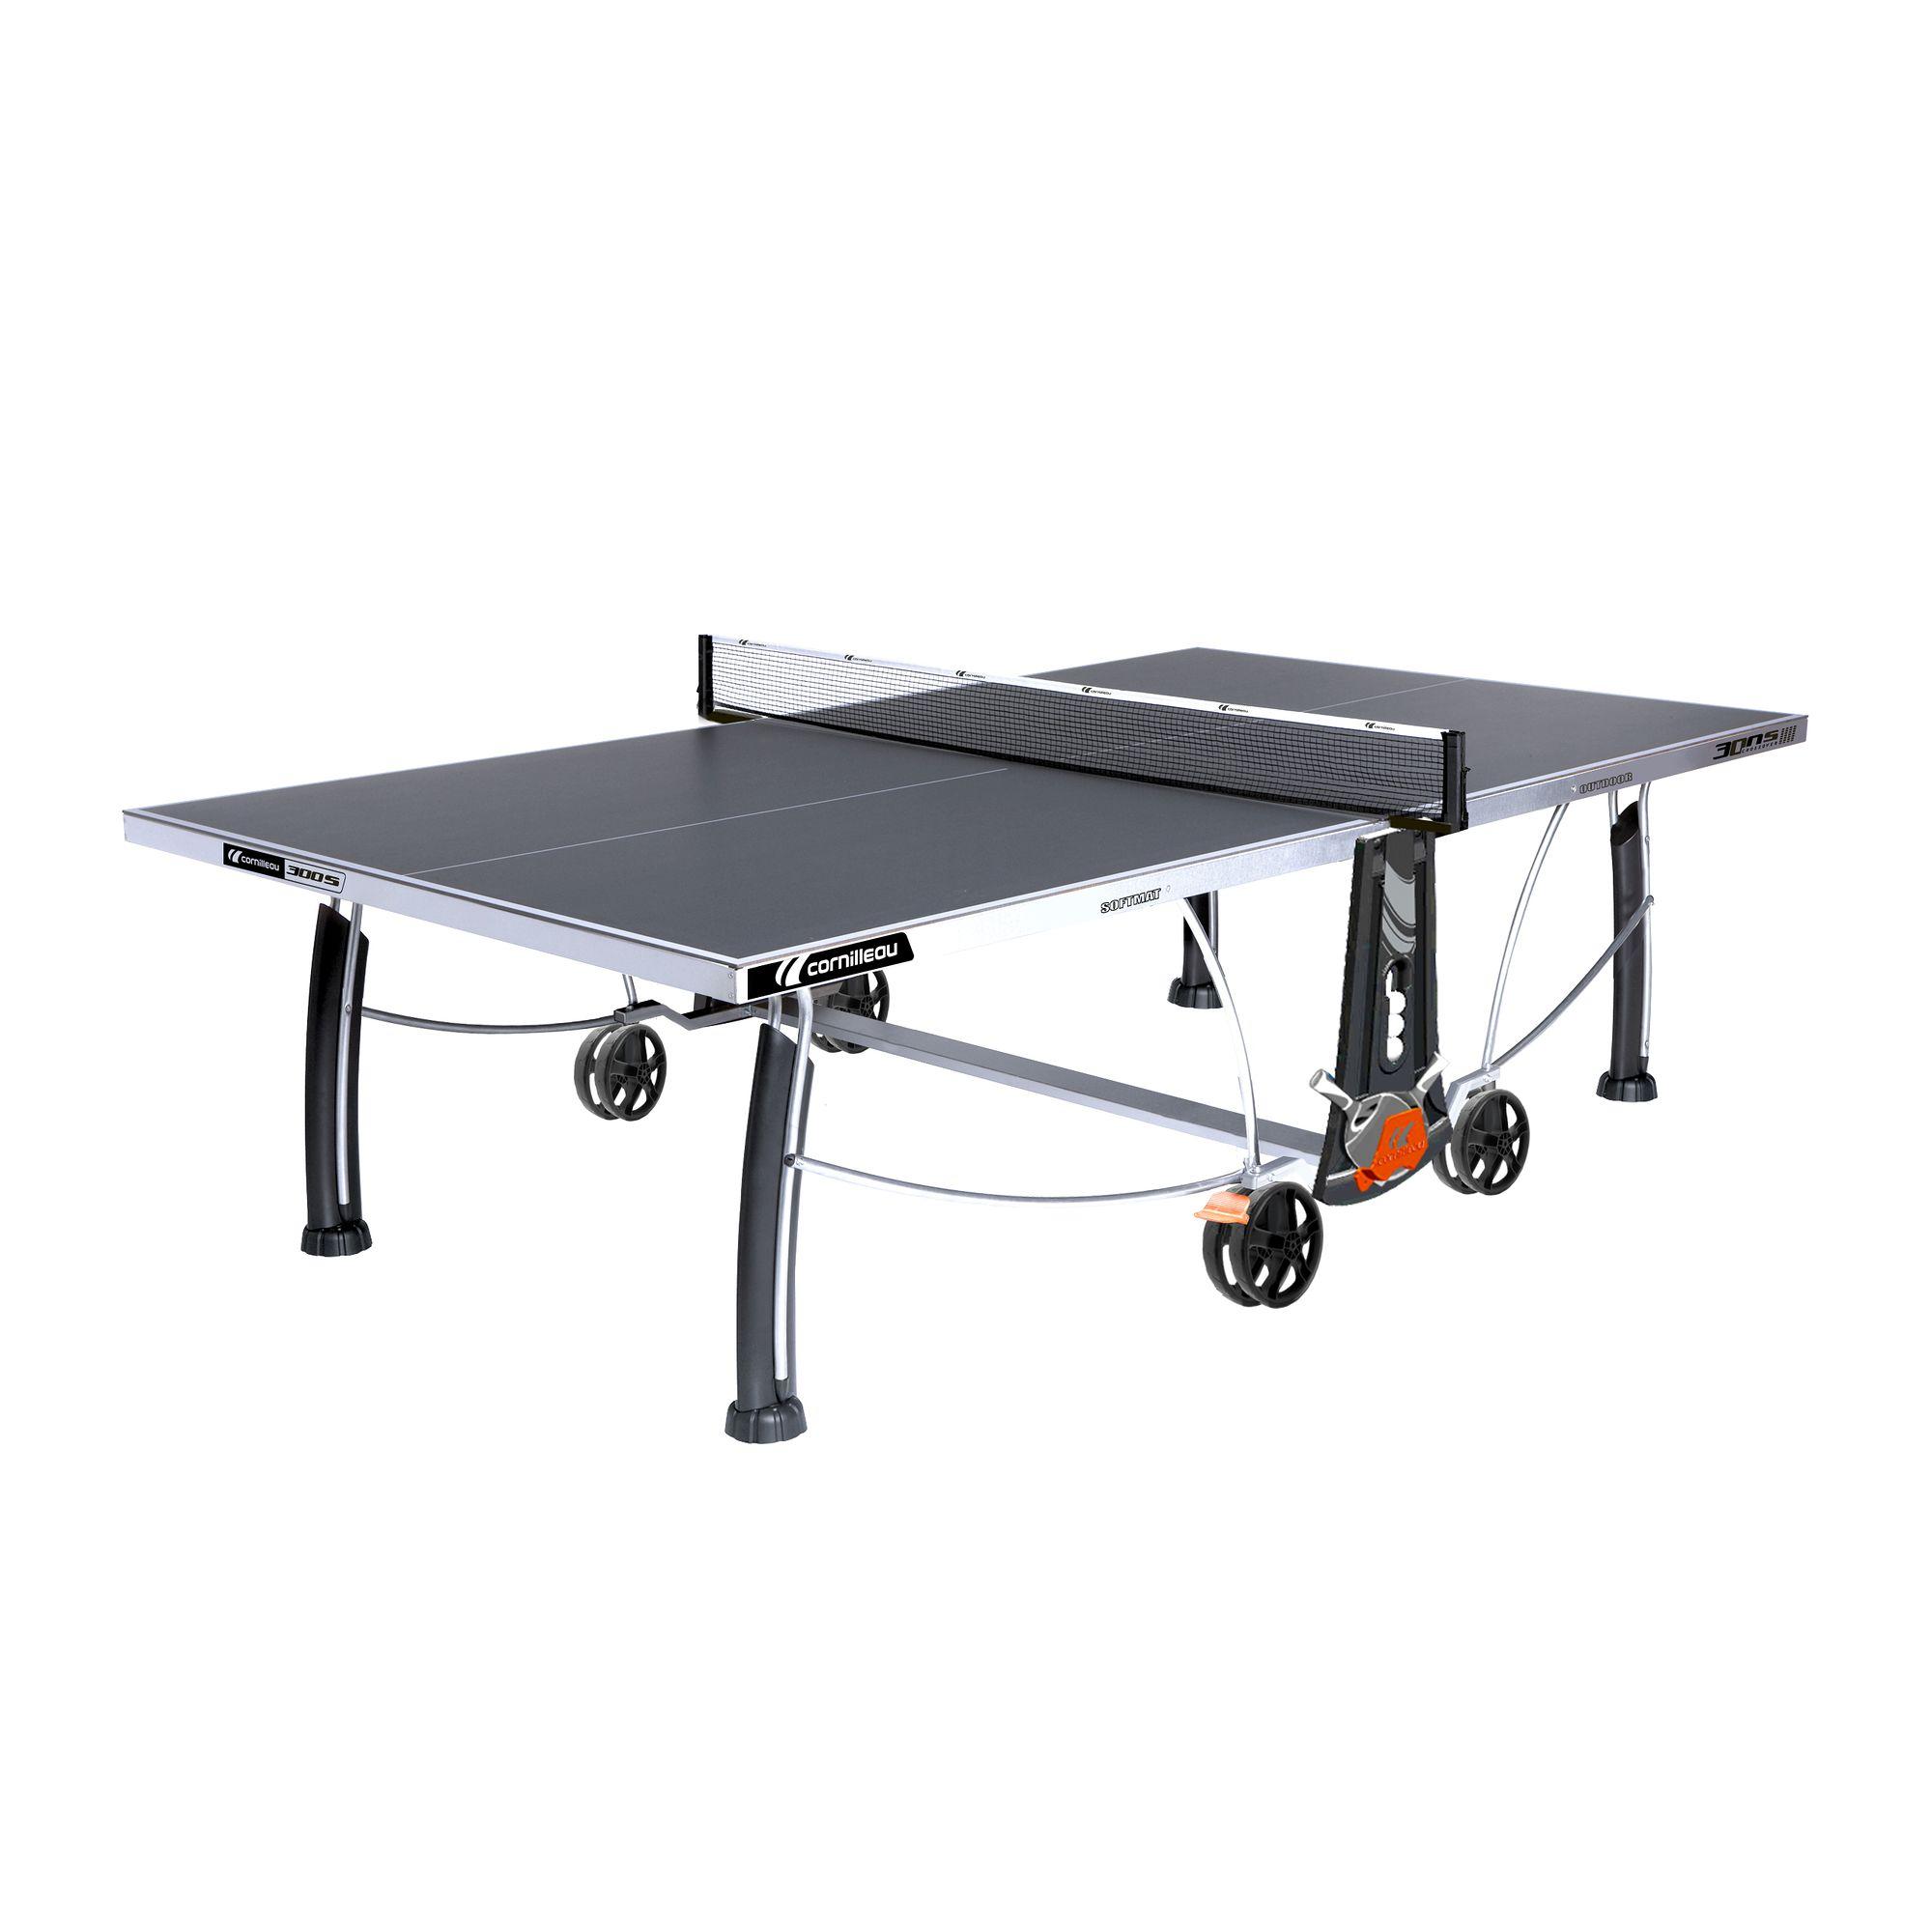 TABLE DE TENNIS DE TABLE FREE CROSSOVER 300S OUTDOOR GRISE